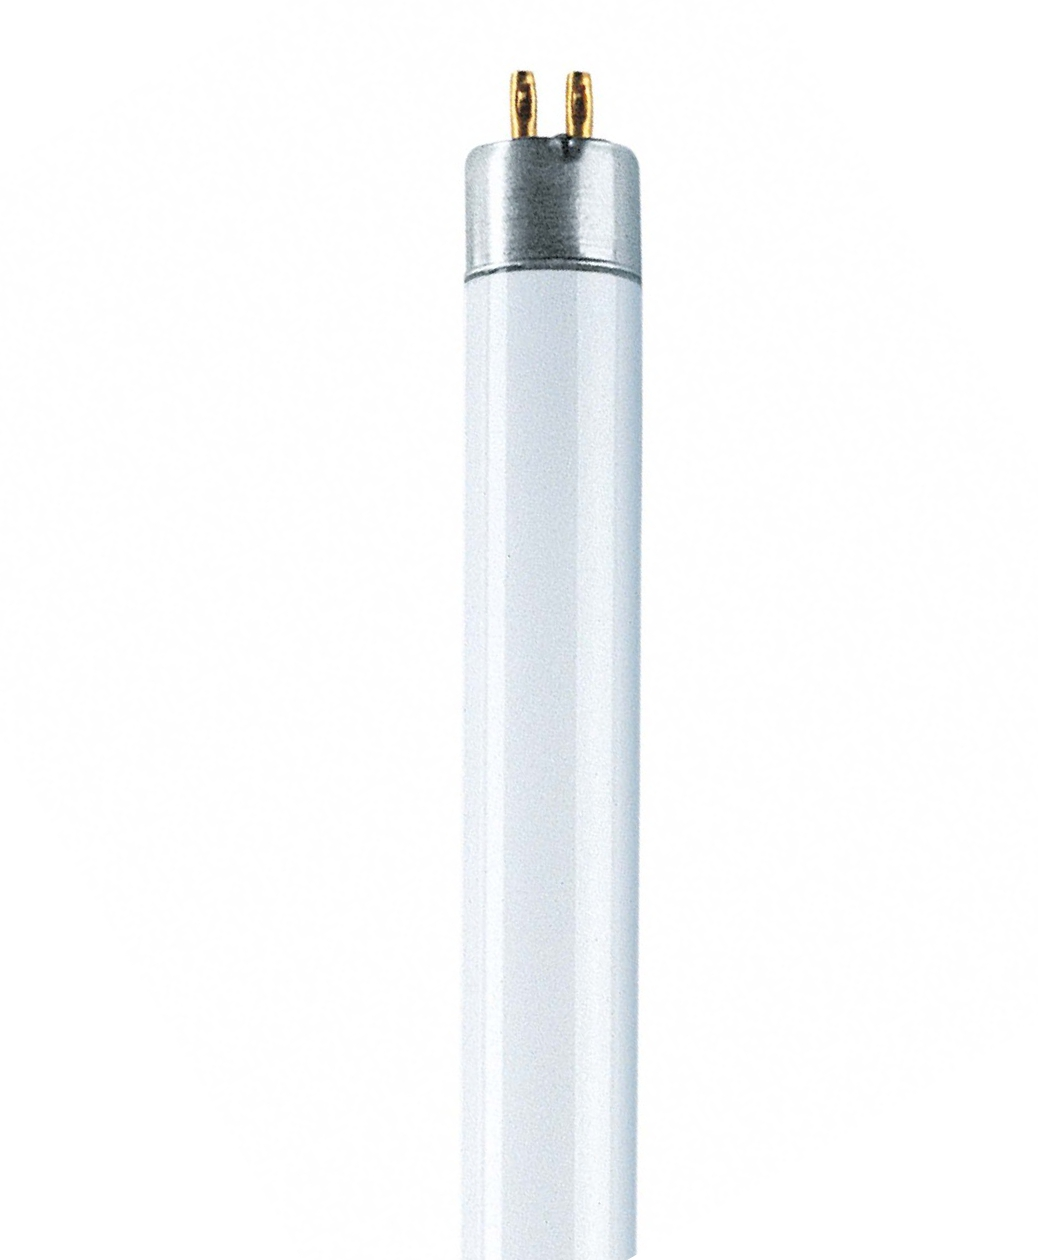 1 Stk T5 39W/830 G5 FLH1, Warmweiß, Leuchtstofflampe LI71390038